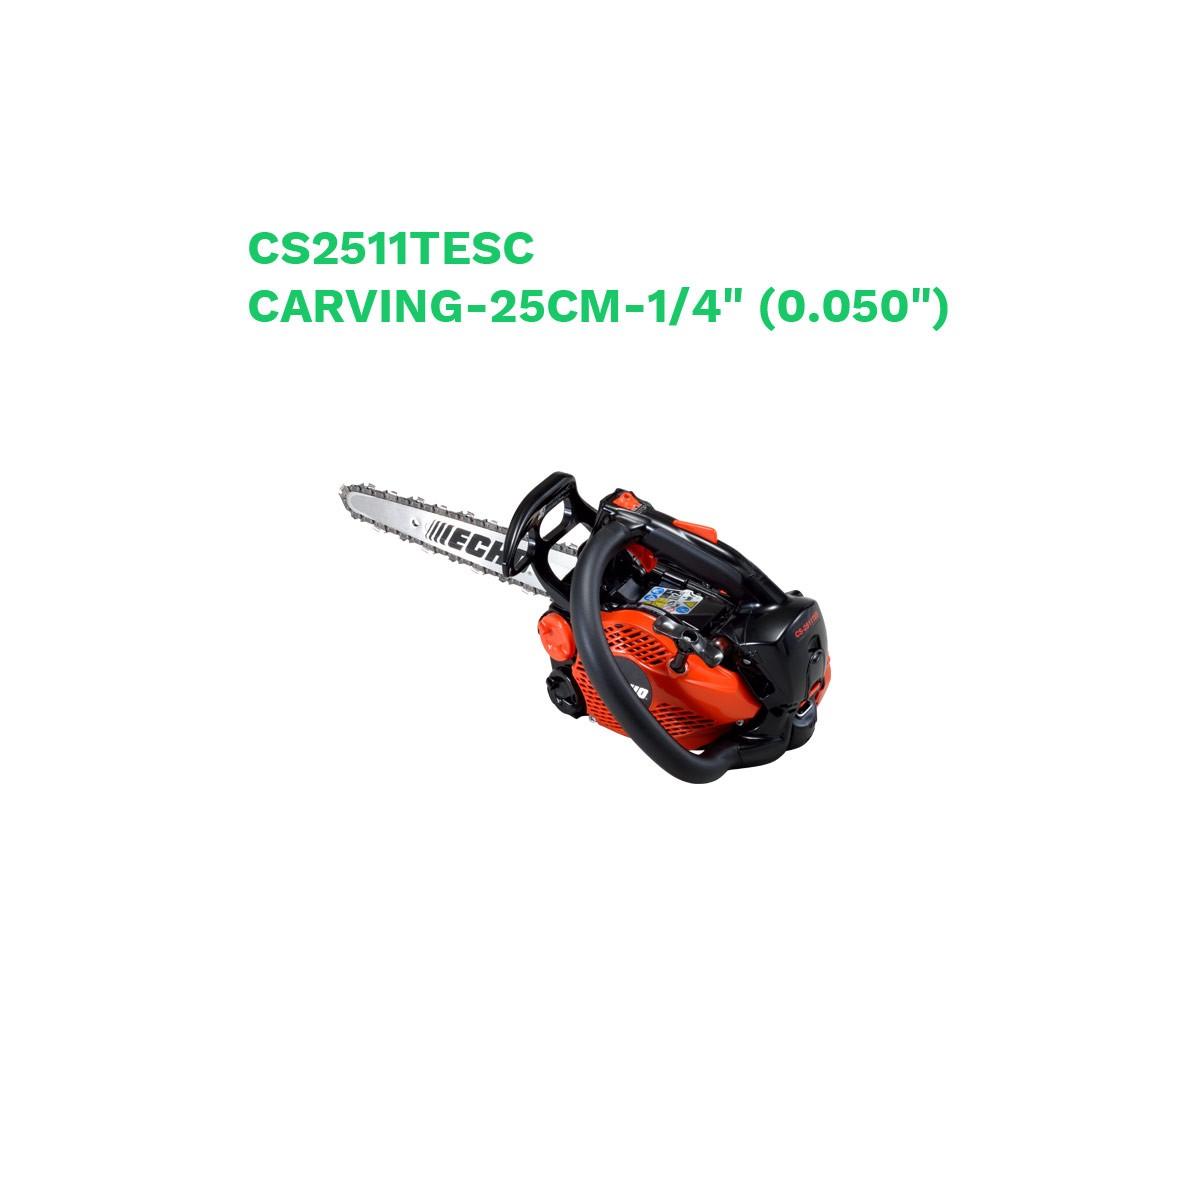 "Echo motosierra cs2511tesc carving-25cm-1/4"" ( 0.050"")"